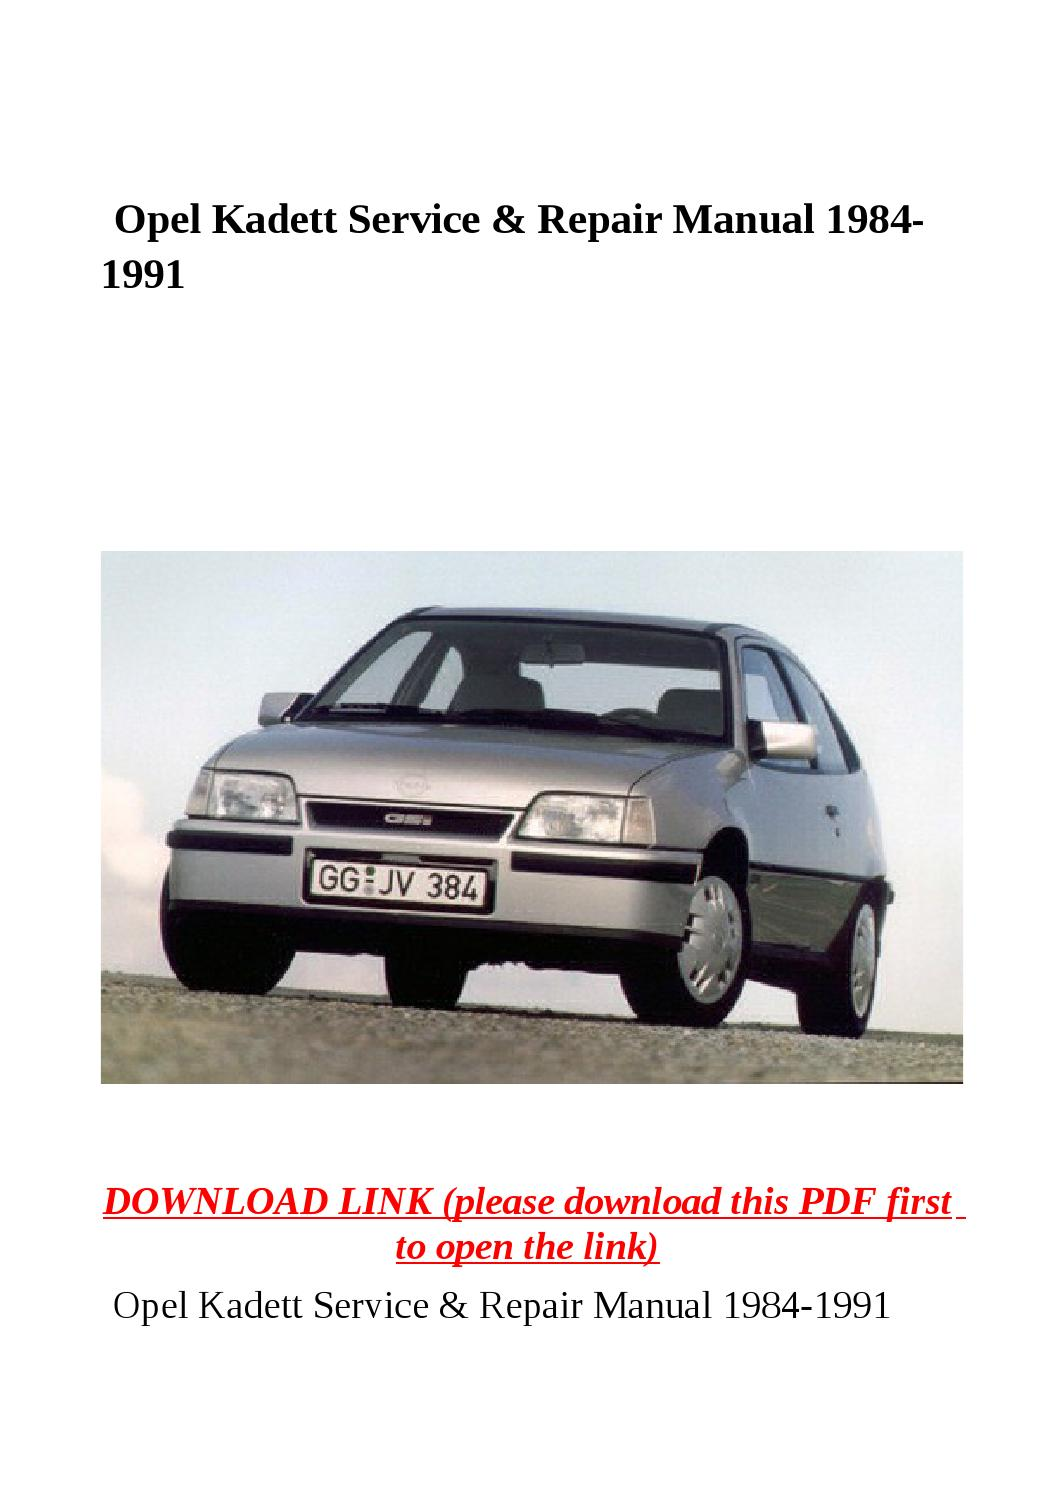 opel kadett service   repair manual 1984 1991 by herrg issuu Interior Opel Corsa C Opel Askona